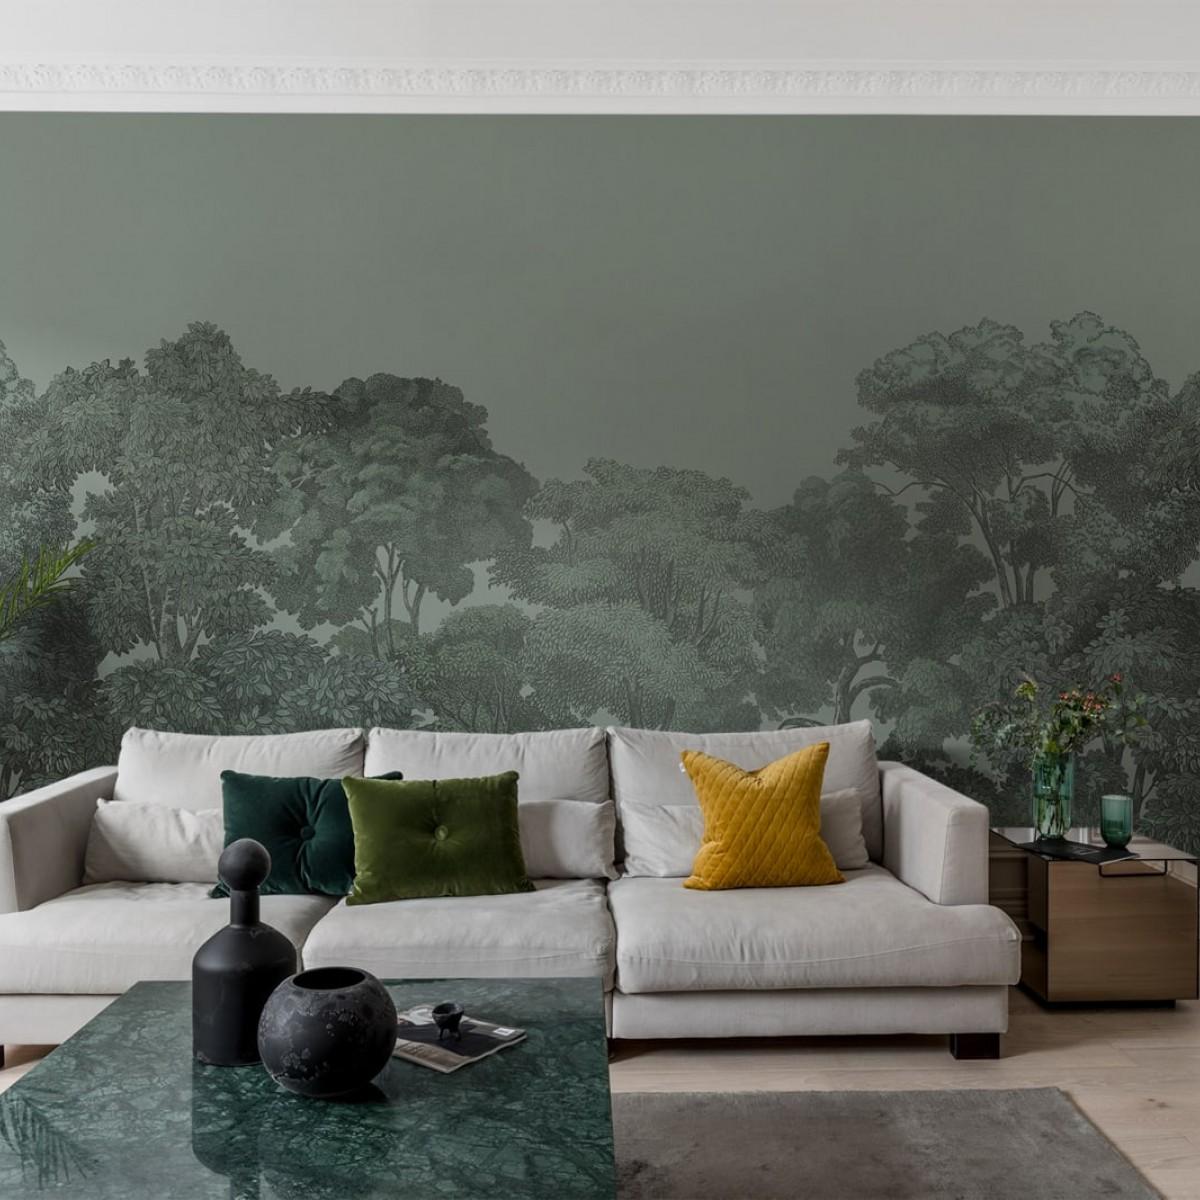 Foto tapet Bellewood, Solid Green, personalizat, Rebel Walls